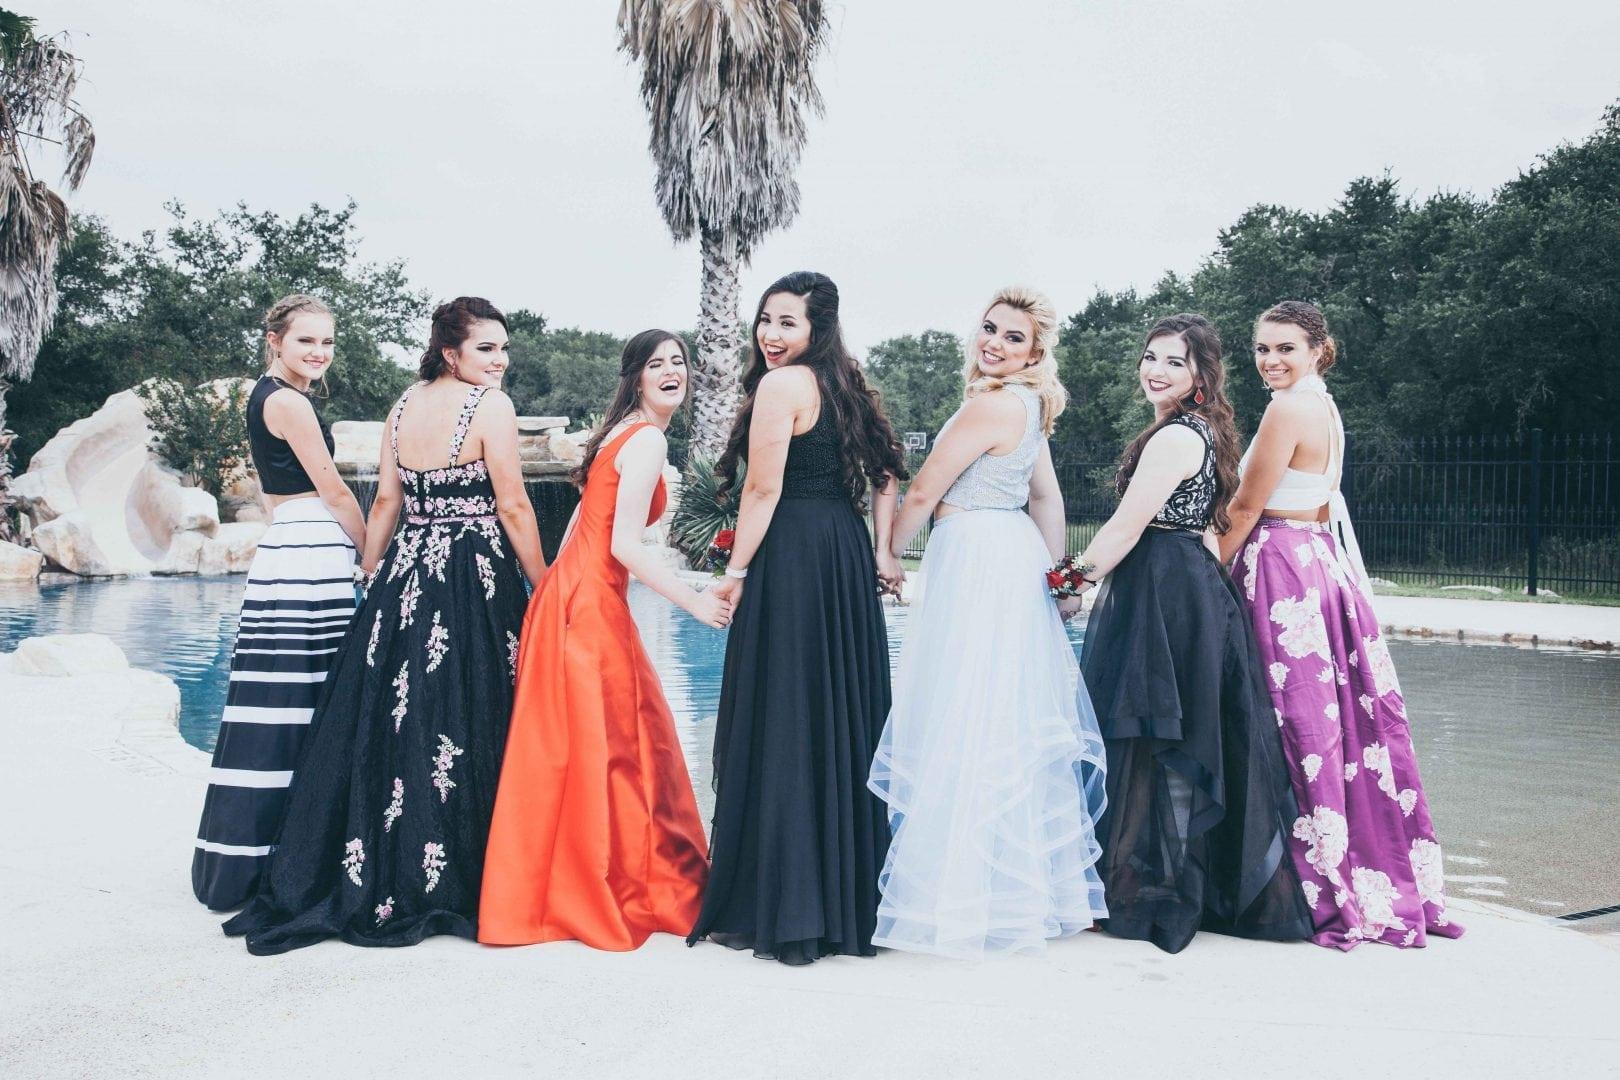 Teen Events, Quinceaneras, Prom, Graduation, Senior Photos